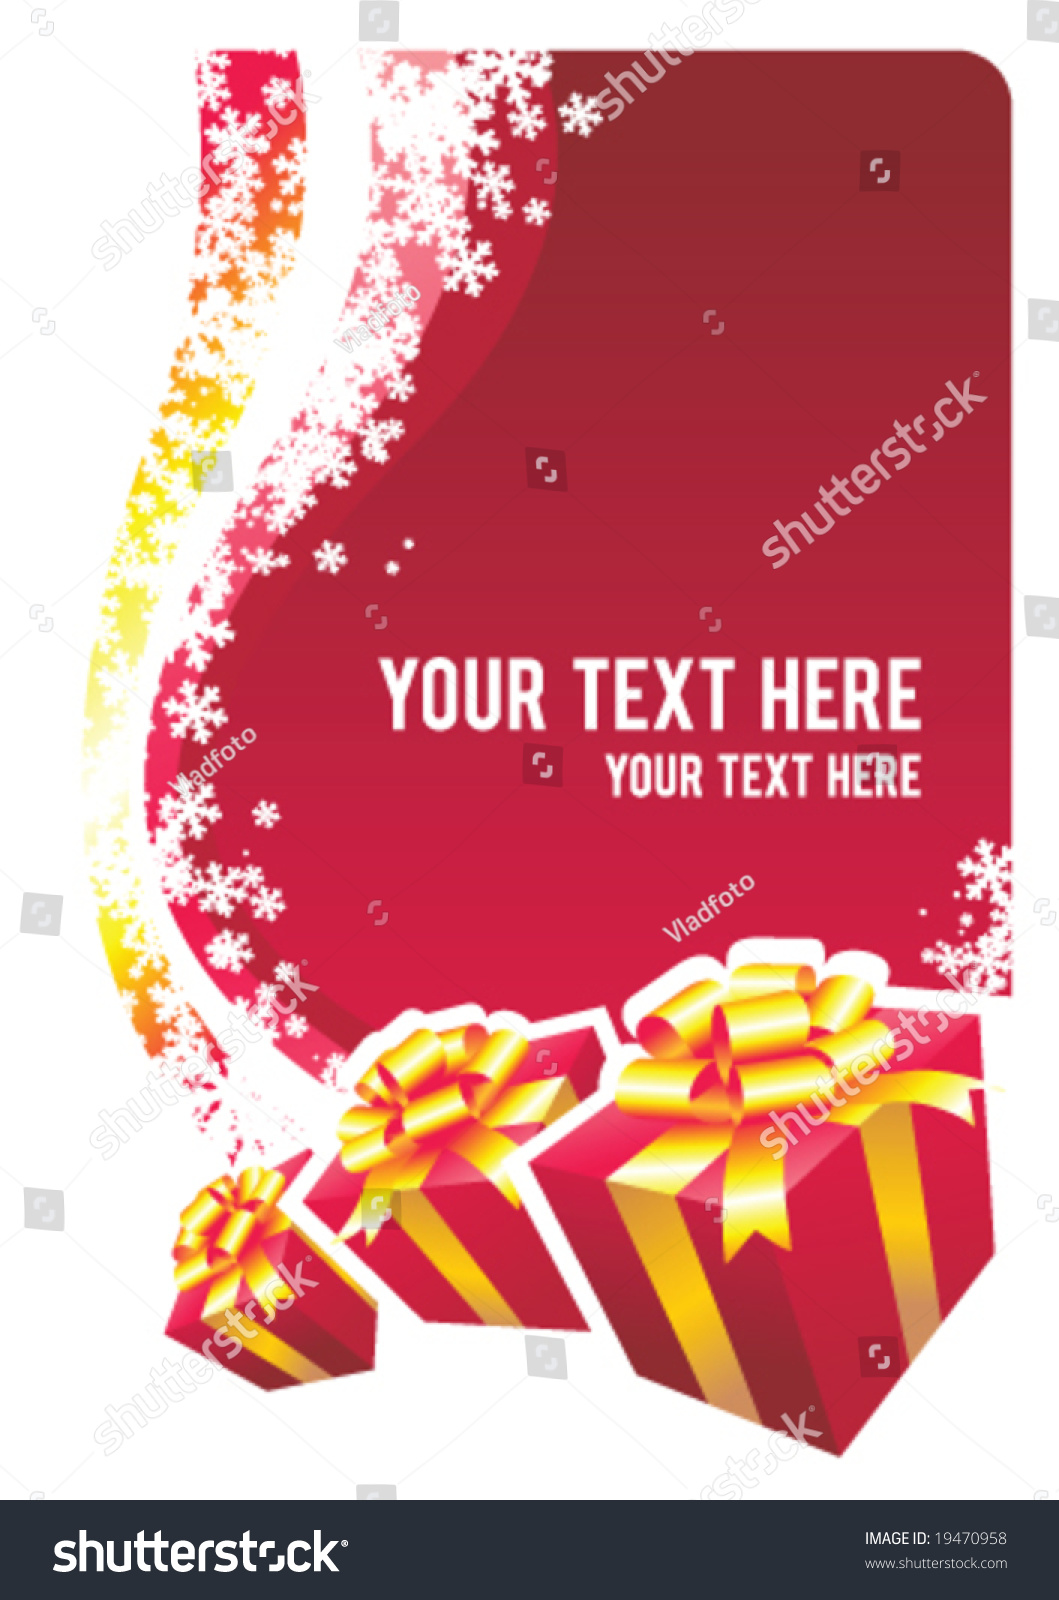 Christmas design copy space vector illustration stock for Copy design